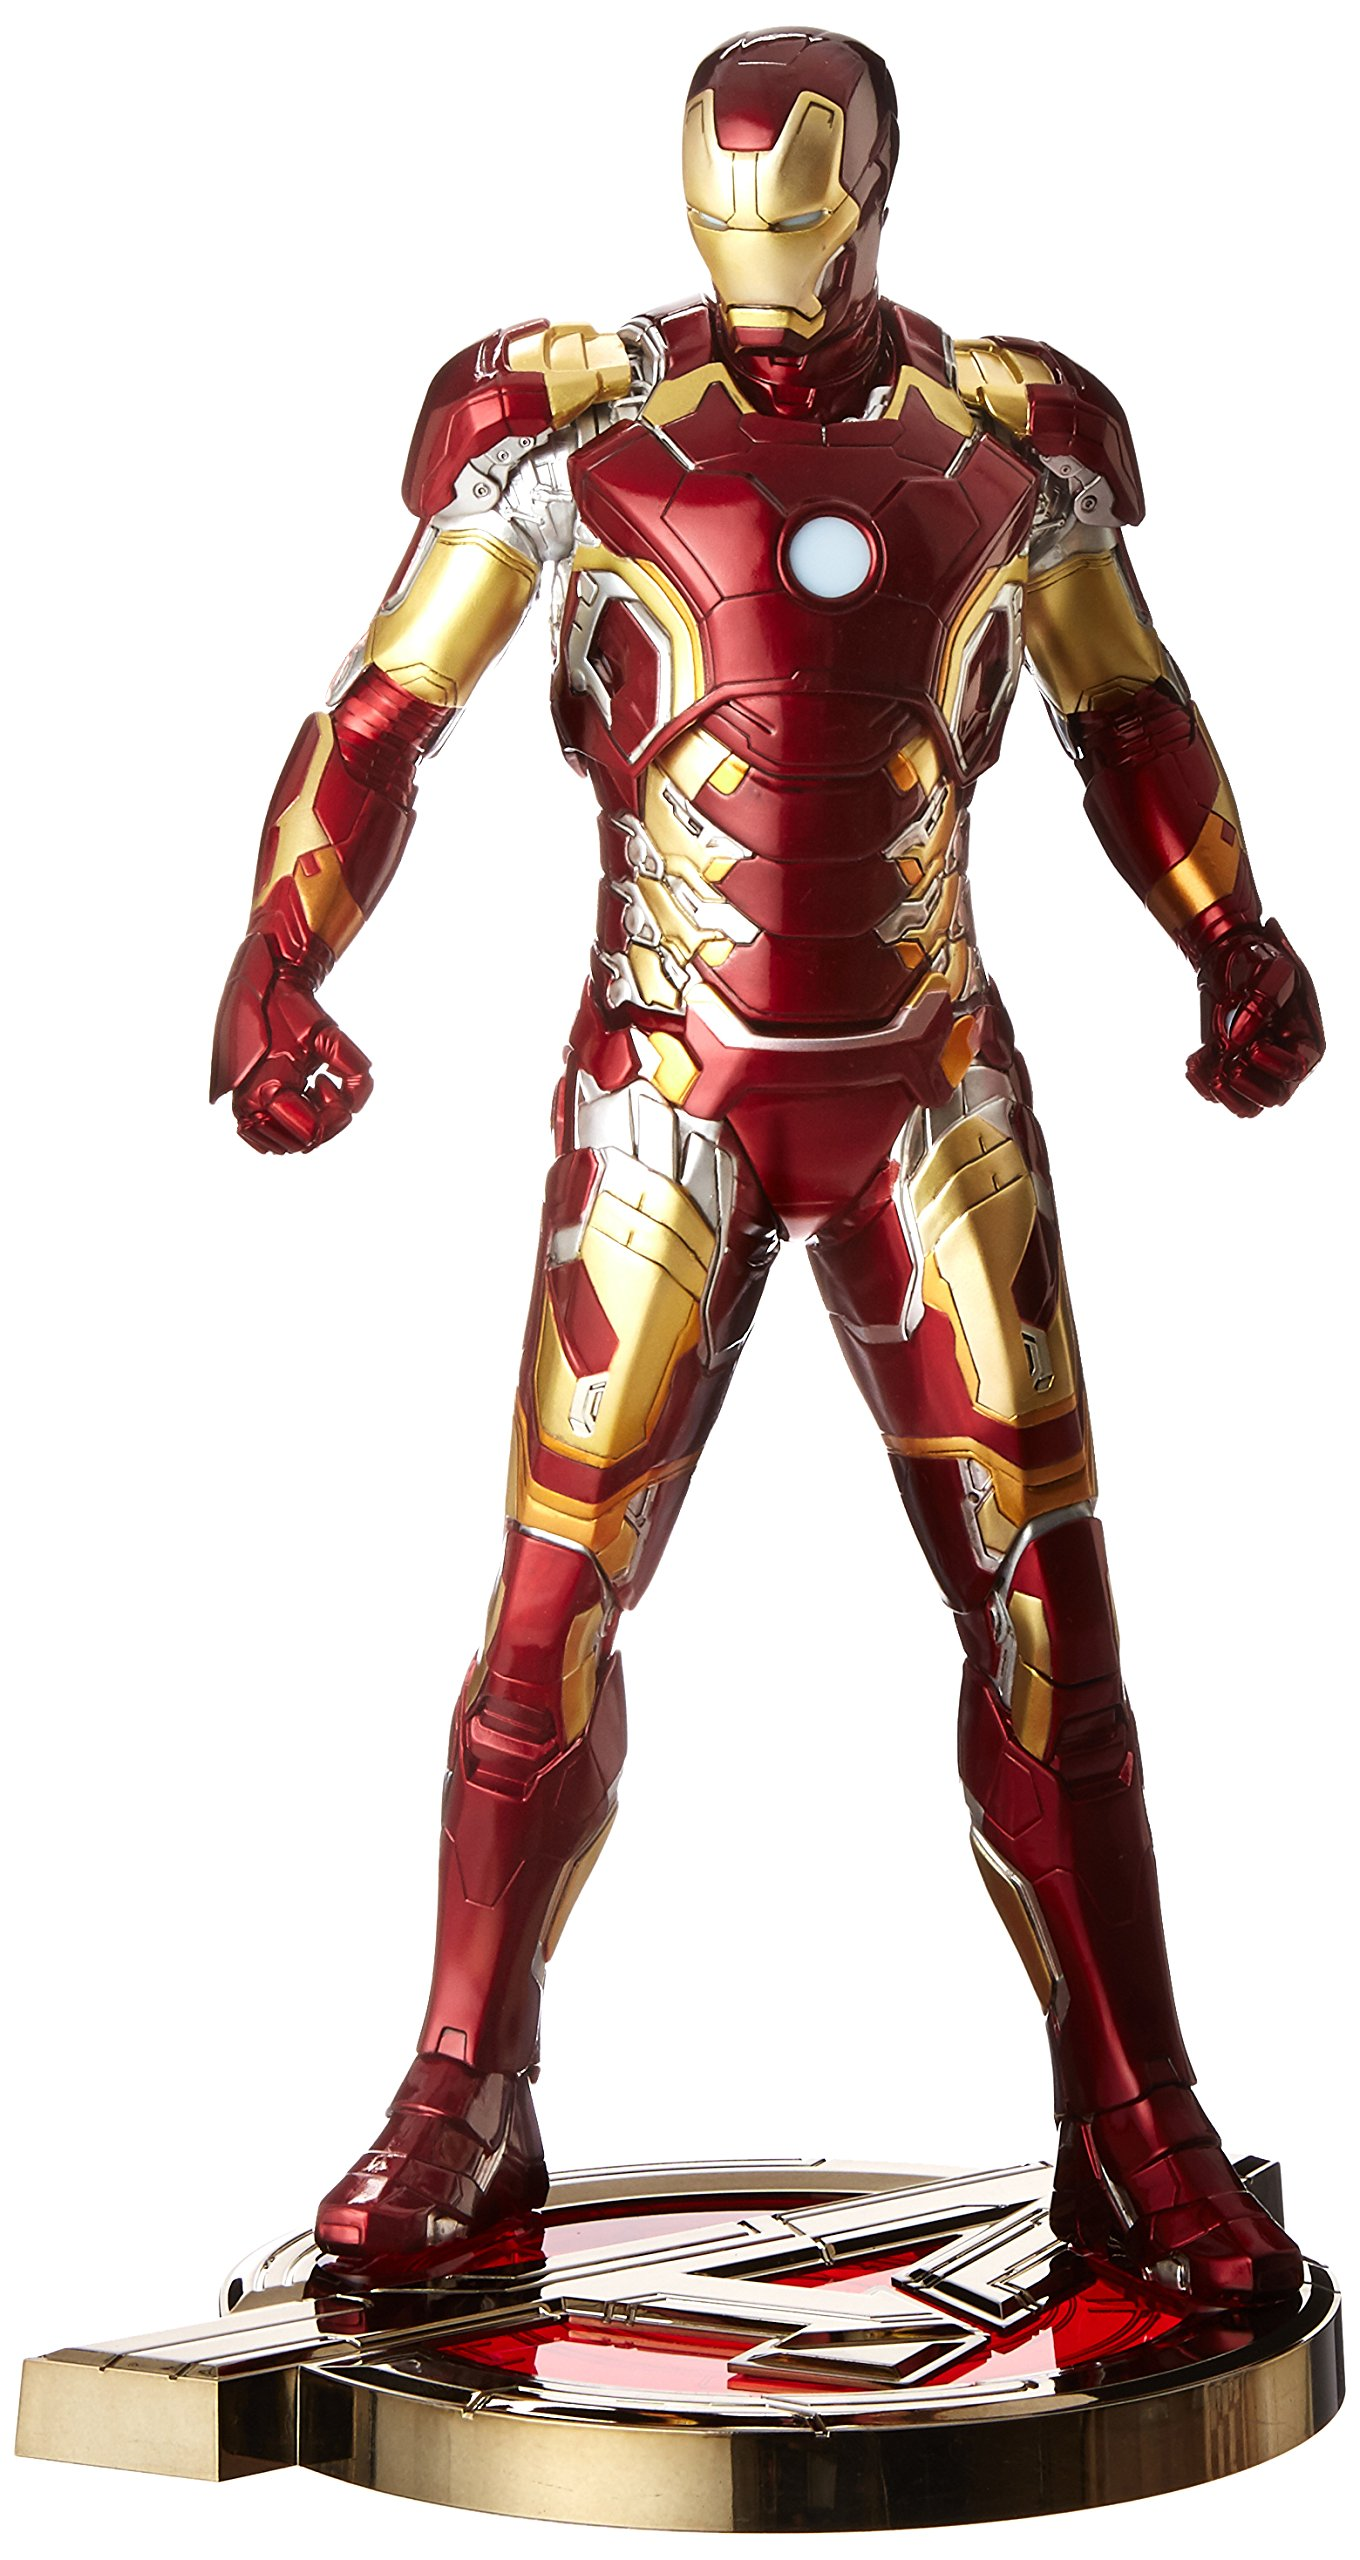 Kotobukiya Avengers: Age Of Ultron Movie Iron Man Mark 43 ArtFX Statue